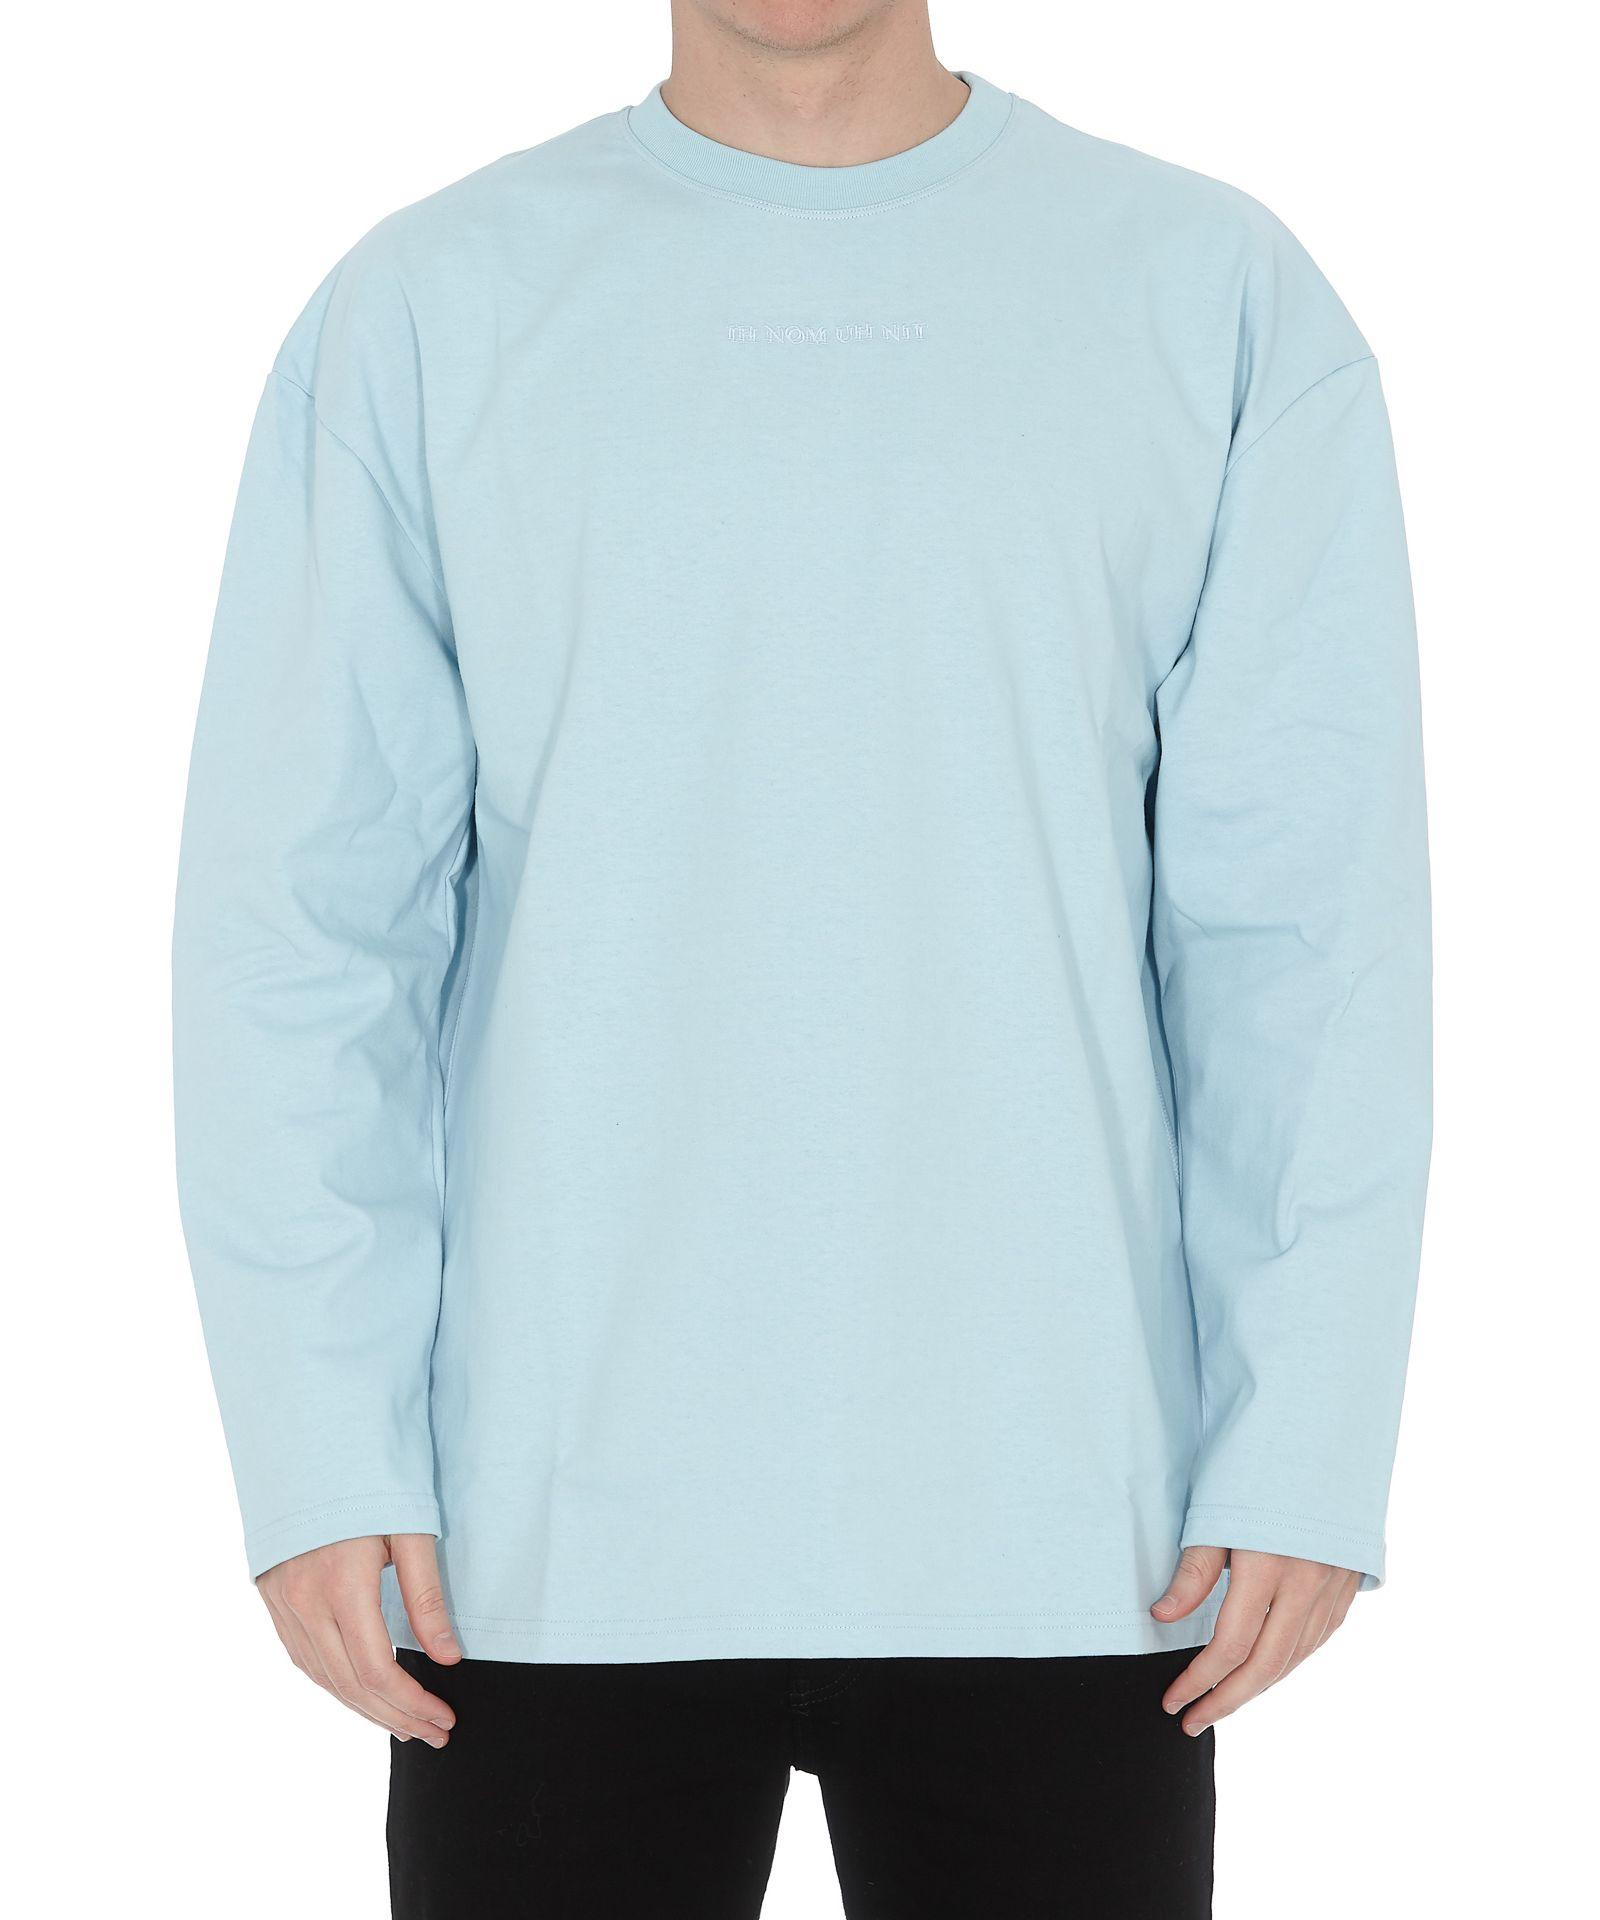 Ih Nom Uh Nit Quote On Back Print Sweatshirt